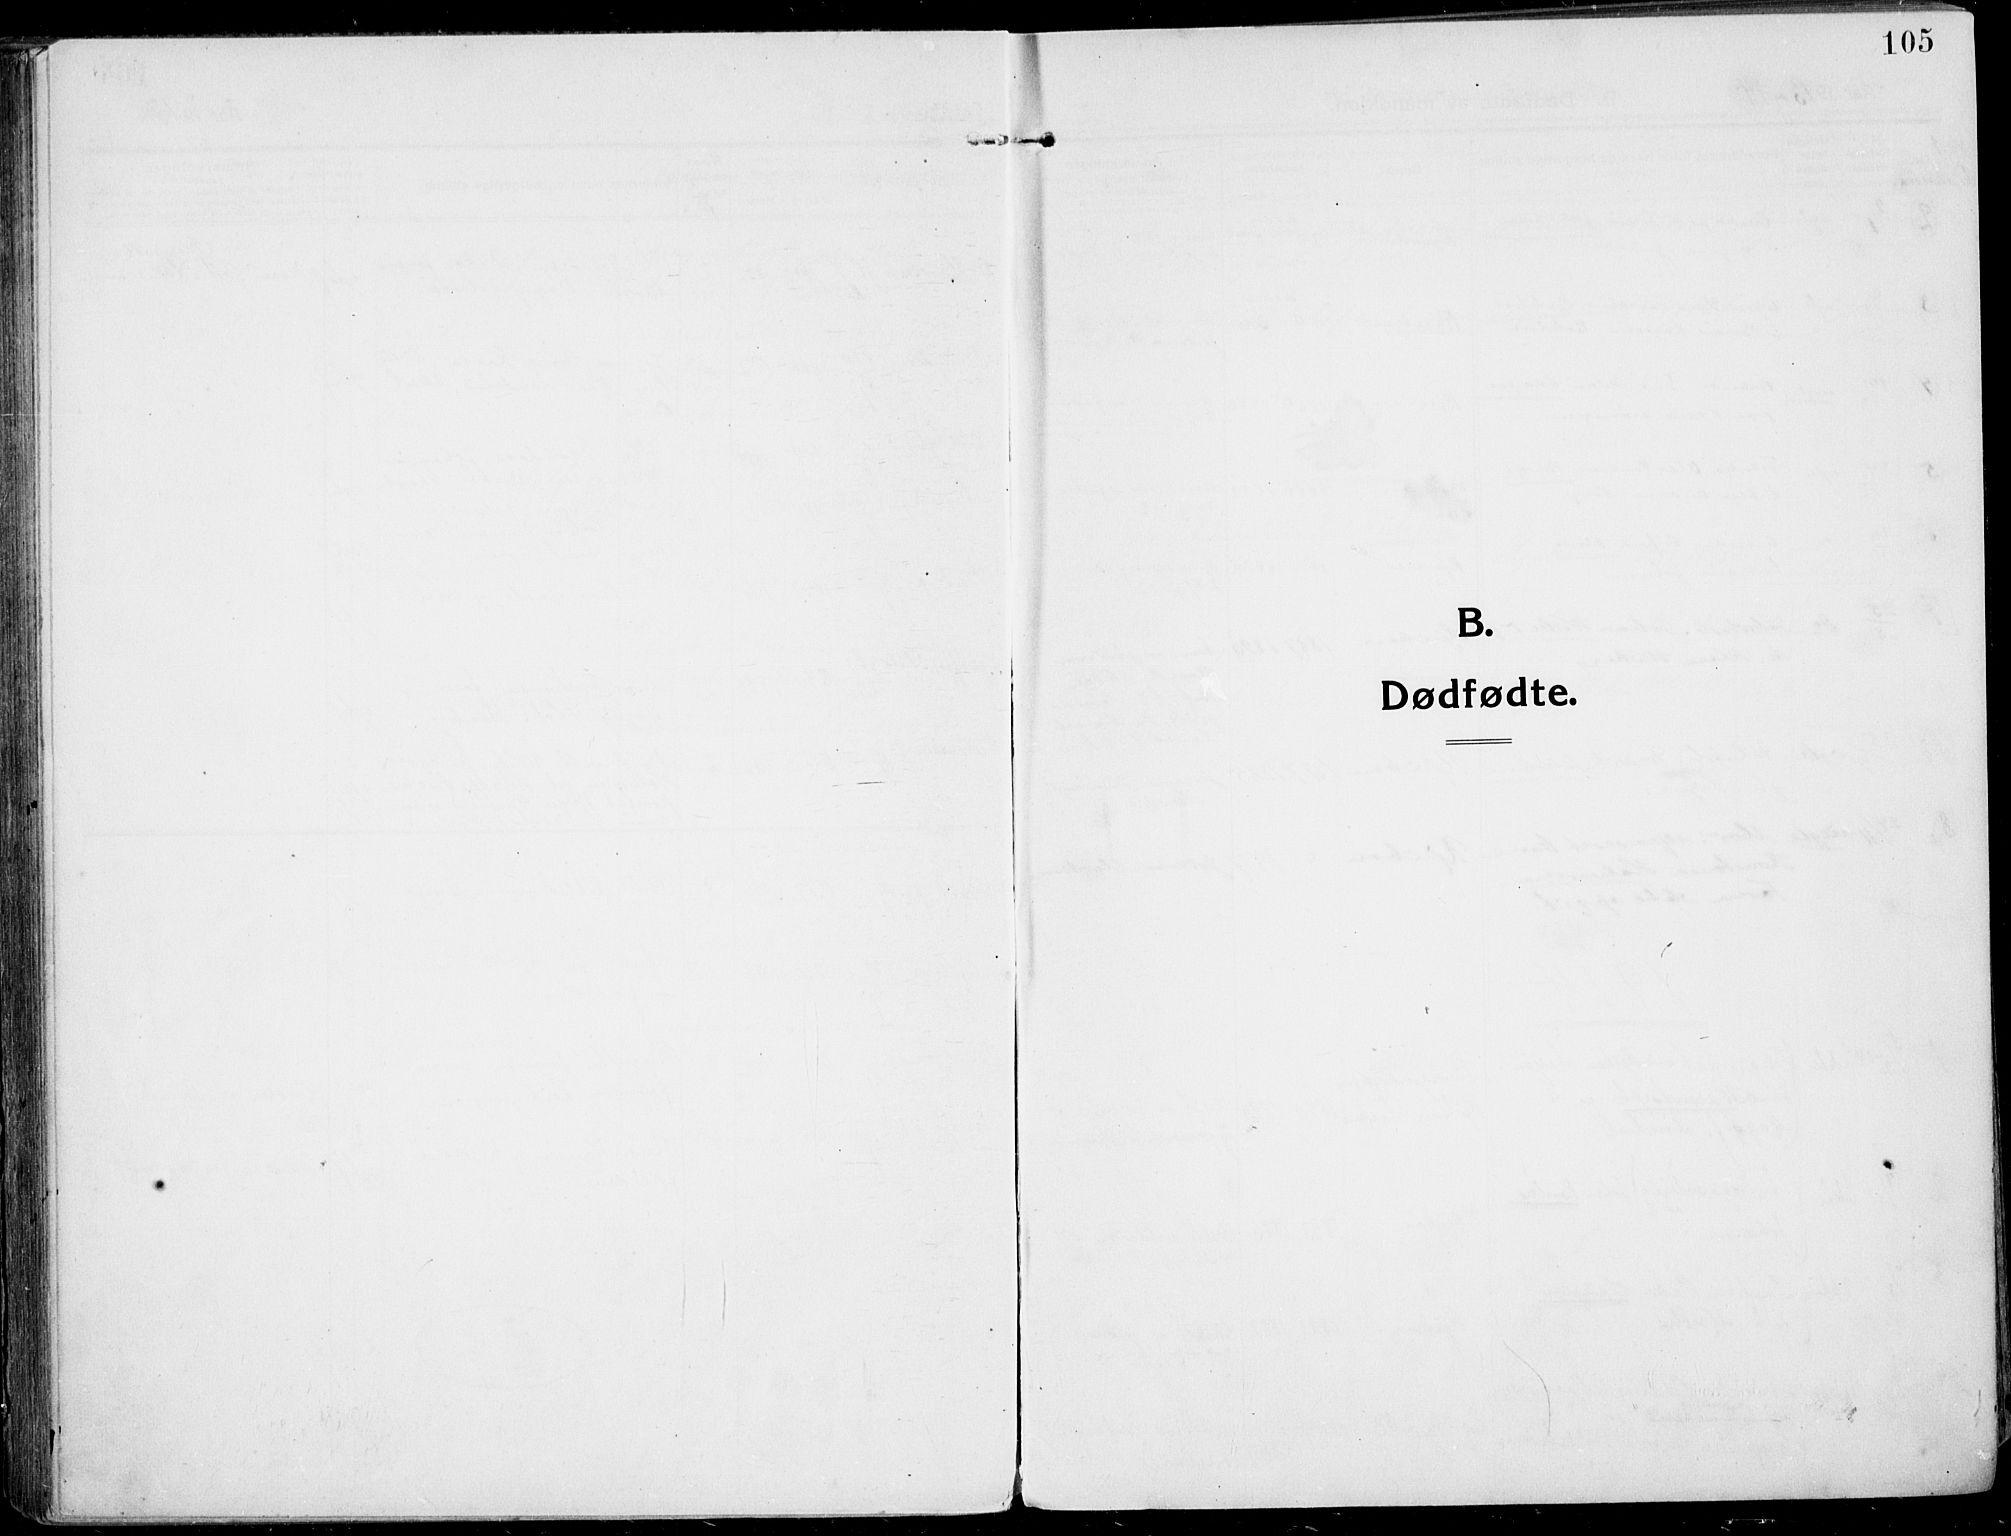 SAKO, Rjukan kirkebøker, F/Fa/L0002: Ministerialbok nr. 2, 1912-1917, s. 105